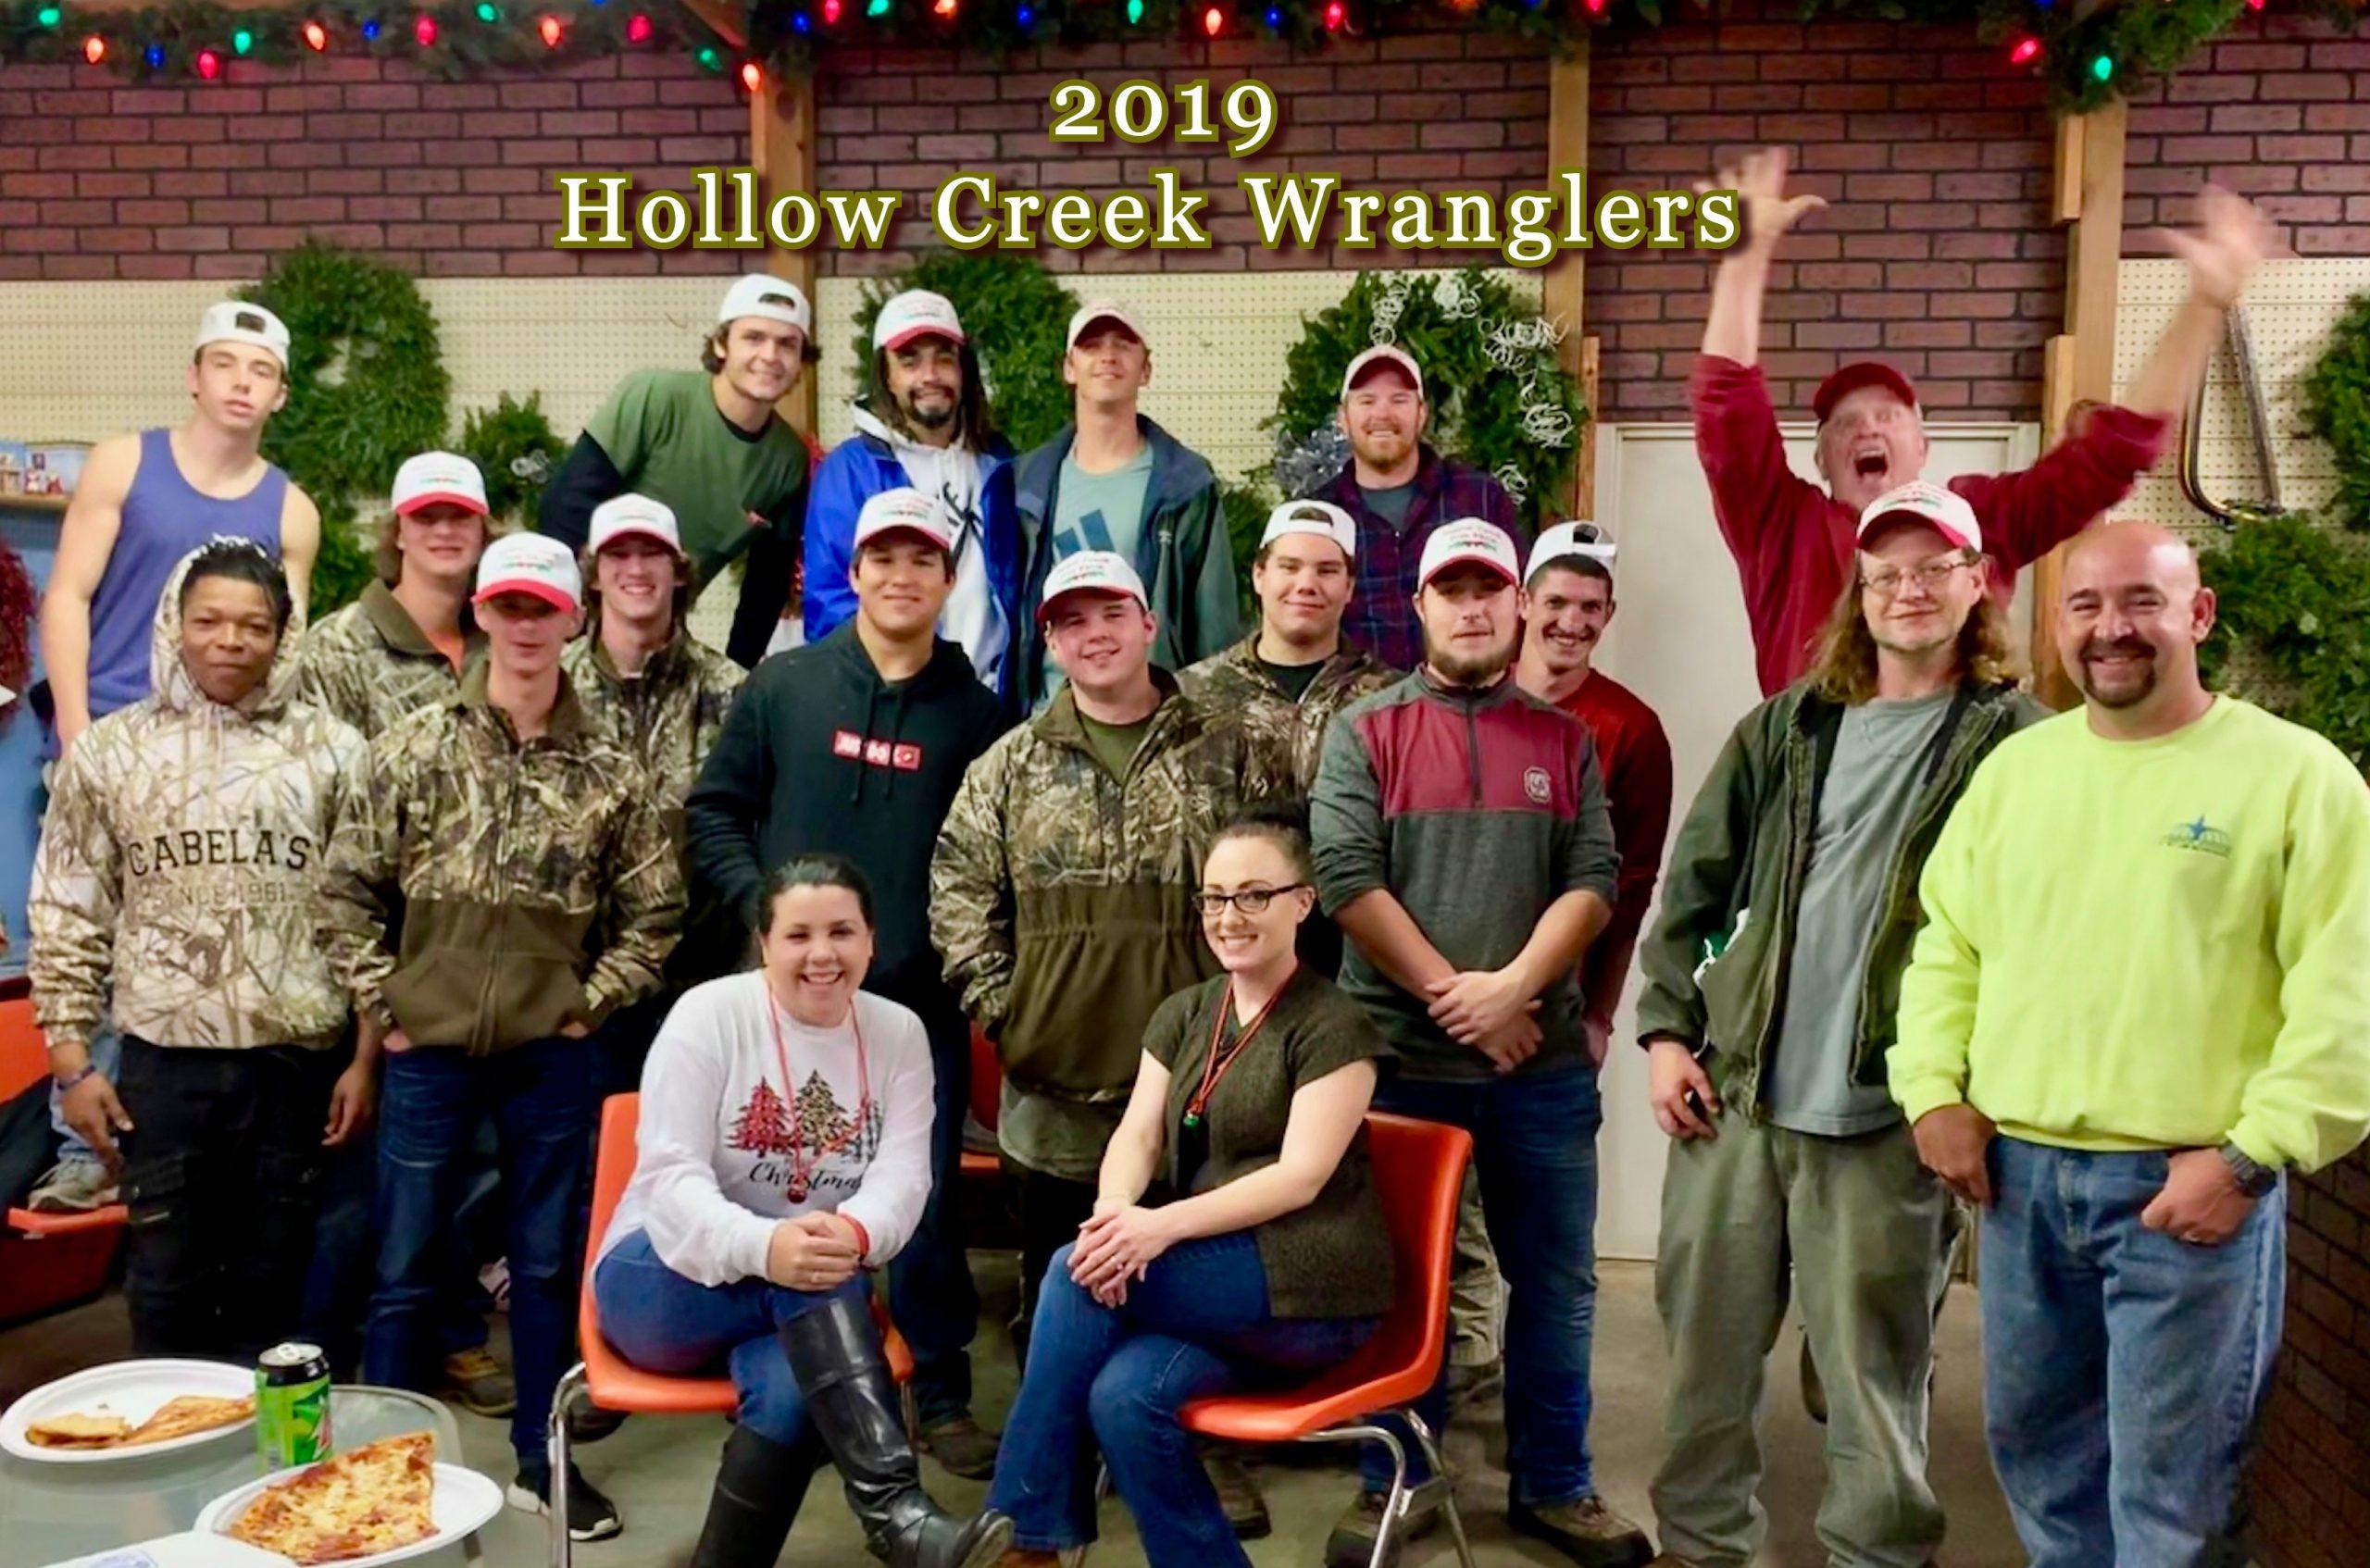 Wranglers 2019 wall